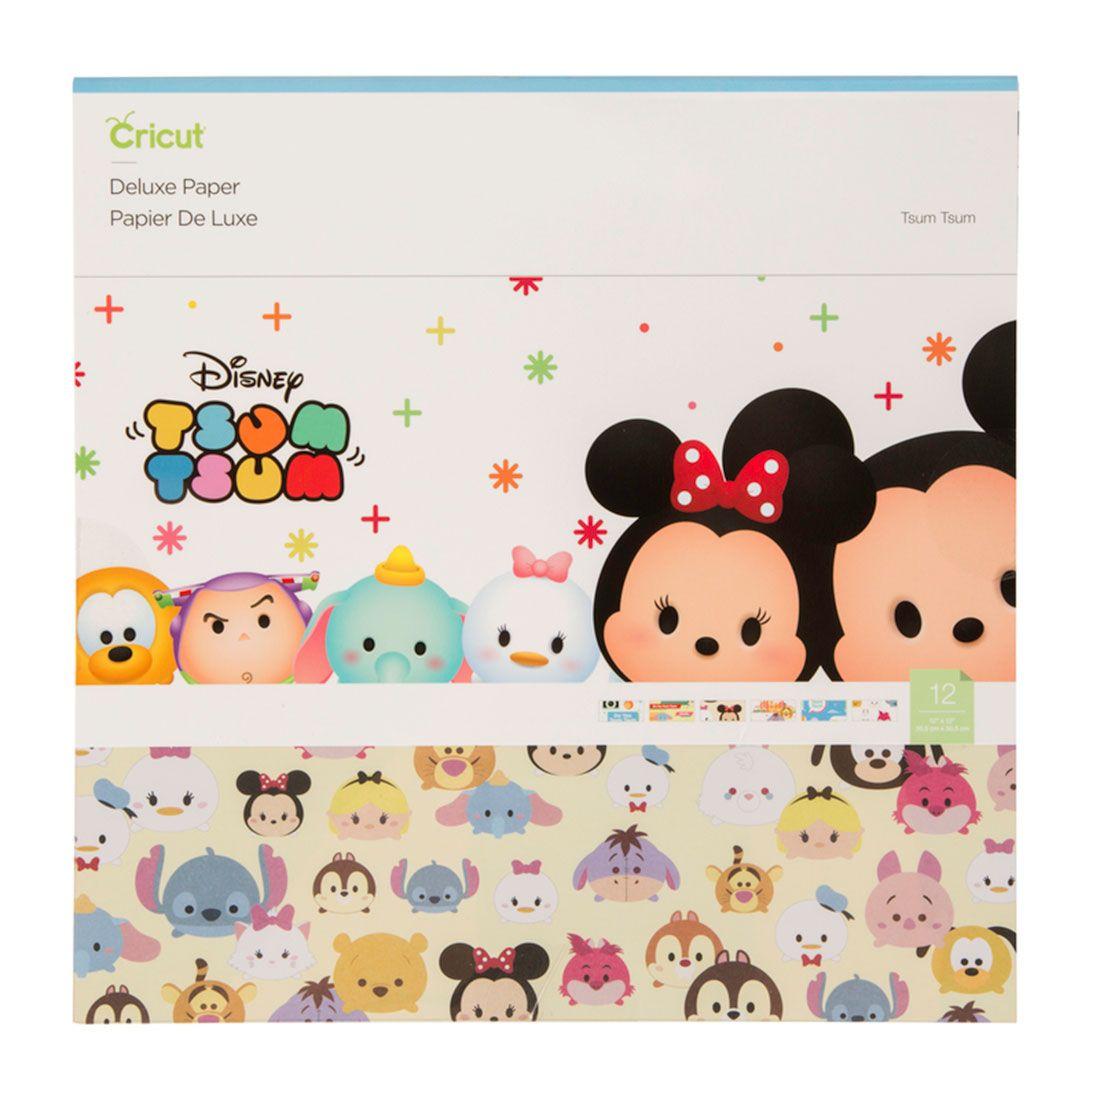 Deluxe Paper, Disney Tsum Tsum